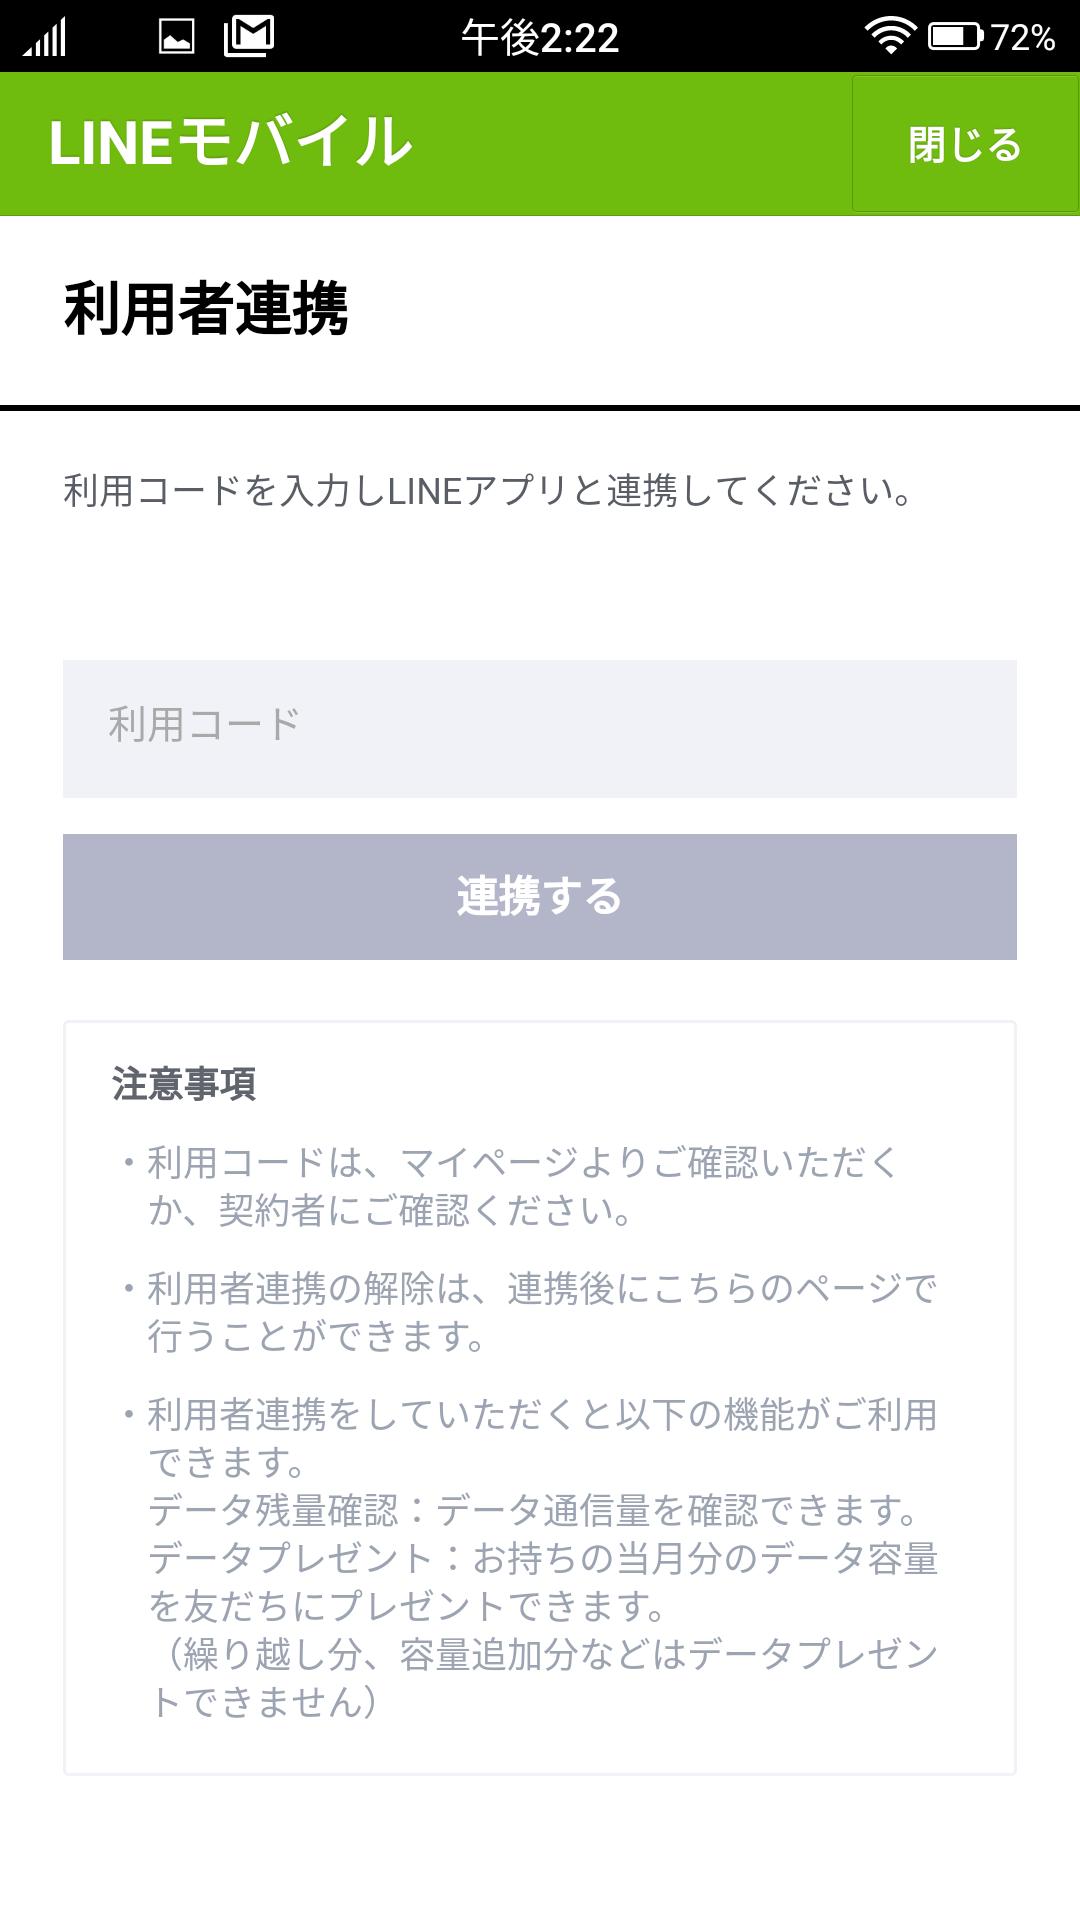 LINEモバイル:LINEアカウントで利用者連携その1